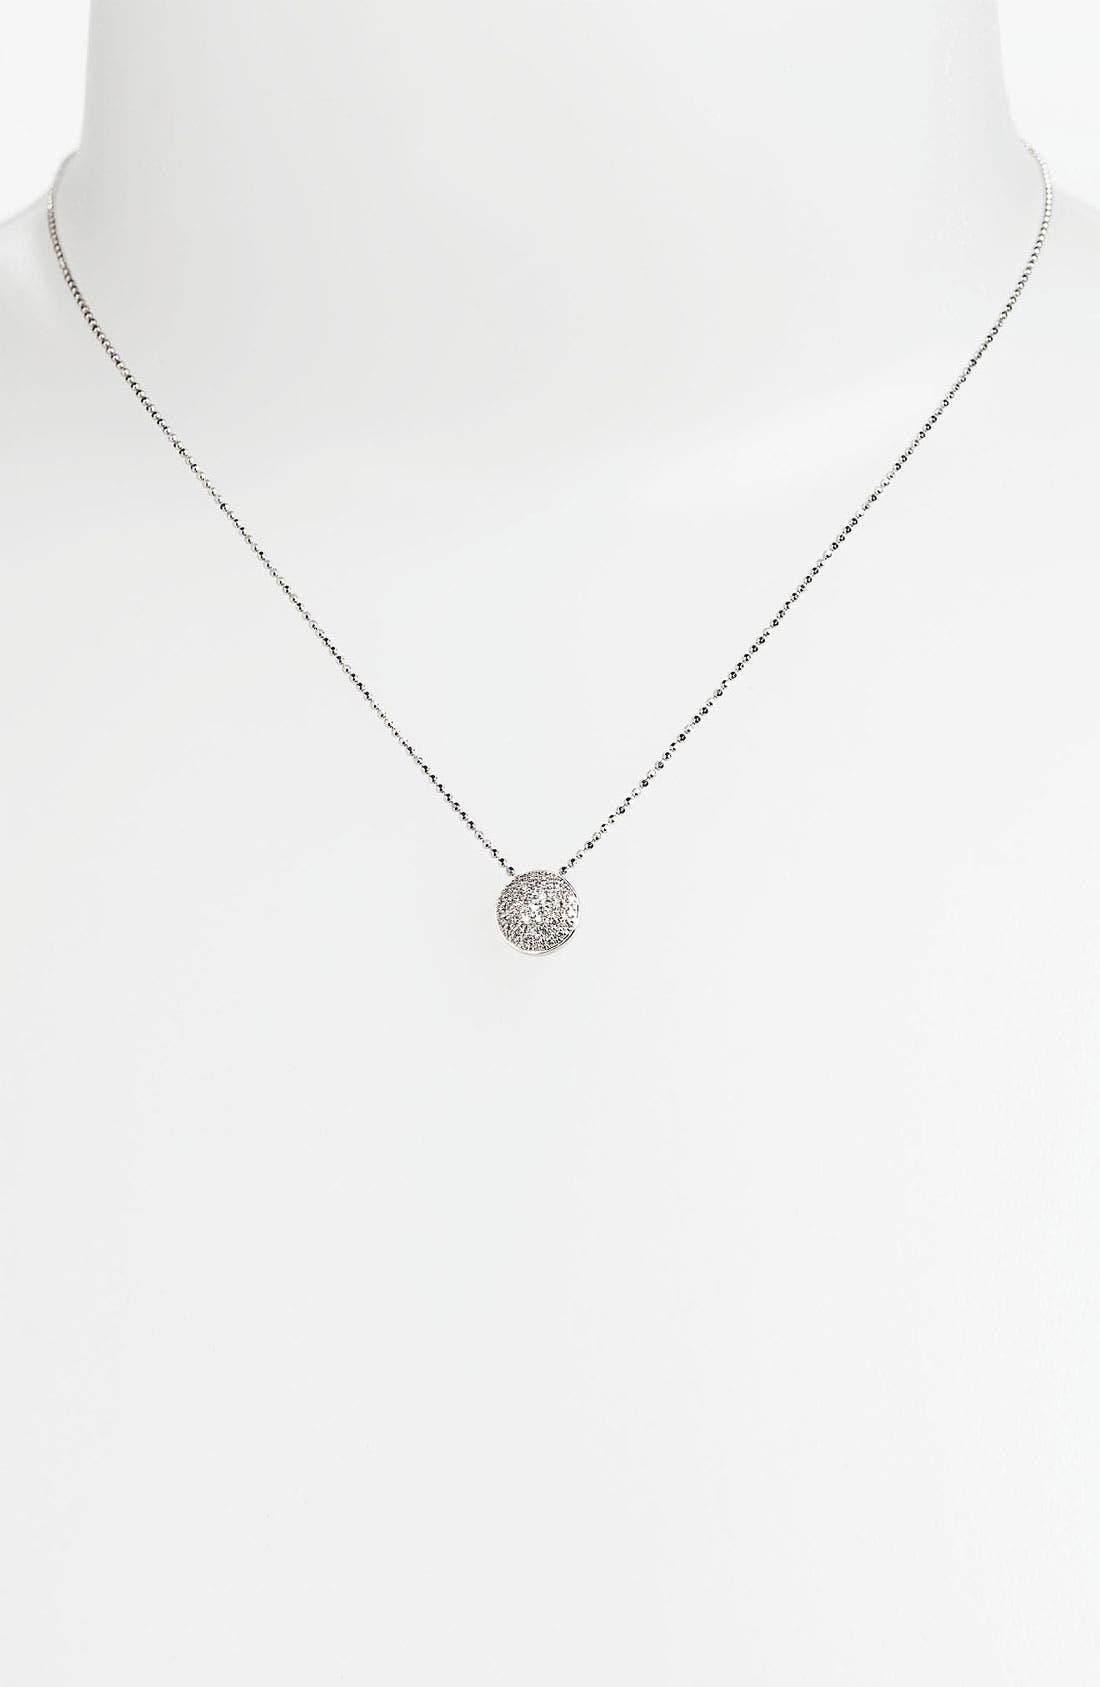 Alternate Image 2  - Bony Levy 'Eclipse' Pavé Diamond Pendant Necklace (Nordstrom Exclusive)